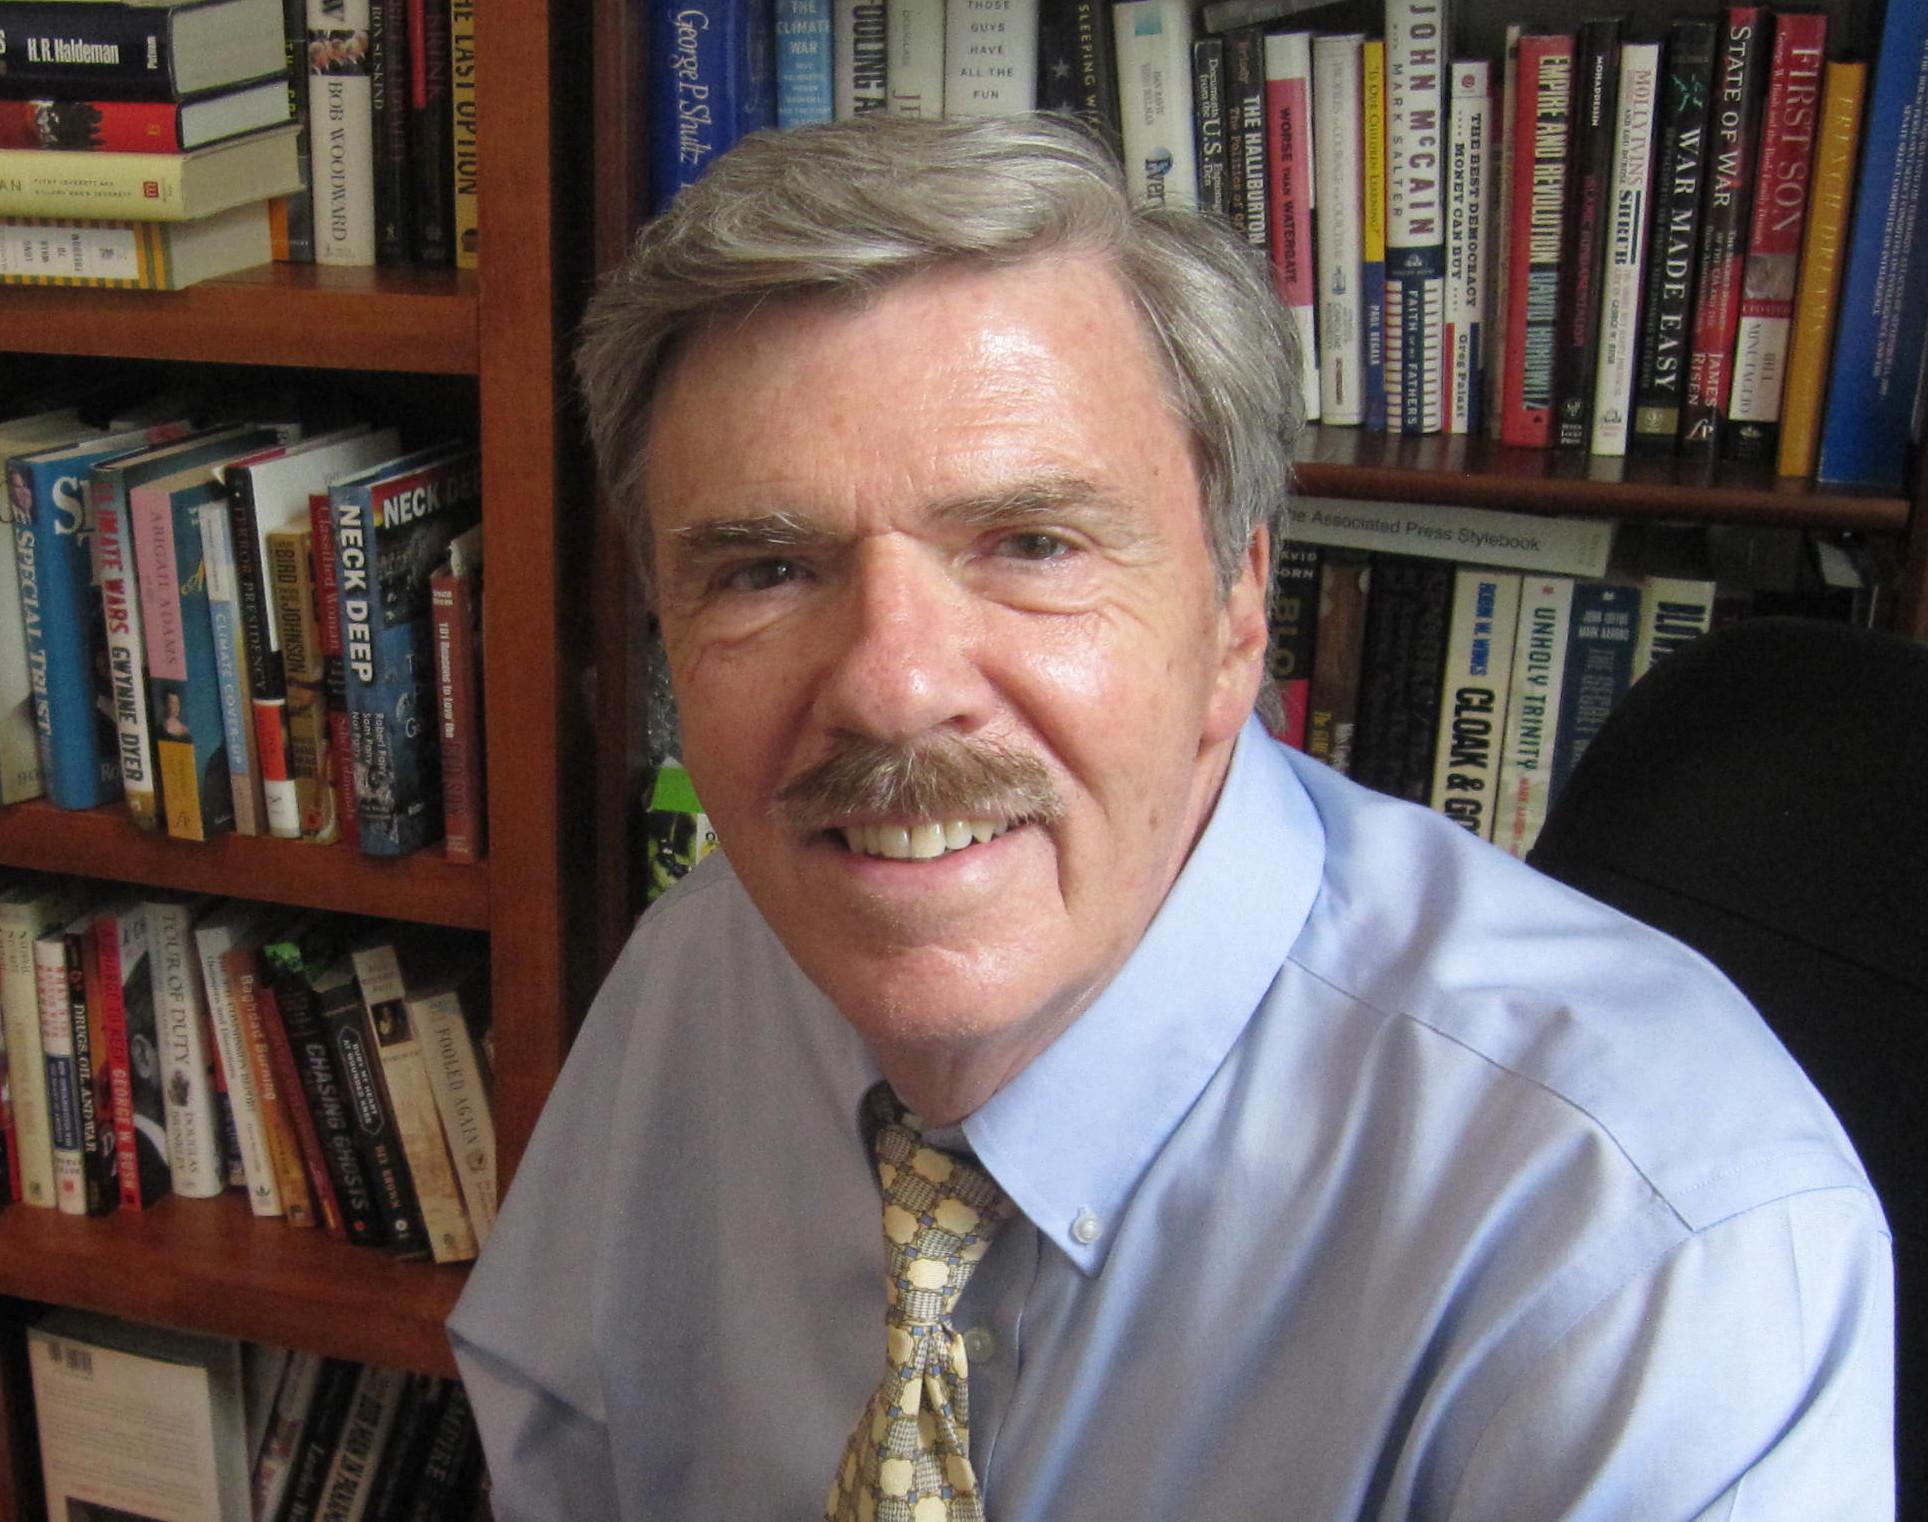 Remembering Robert Parry, a Believer in Journalism